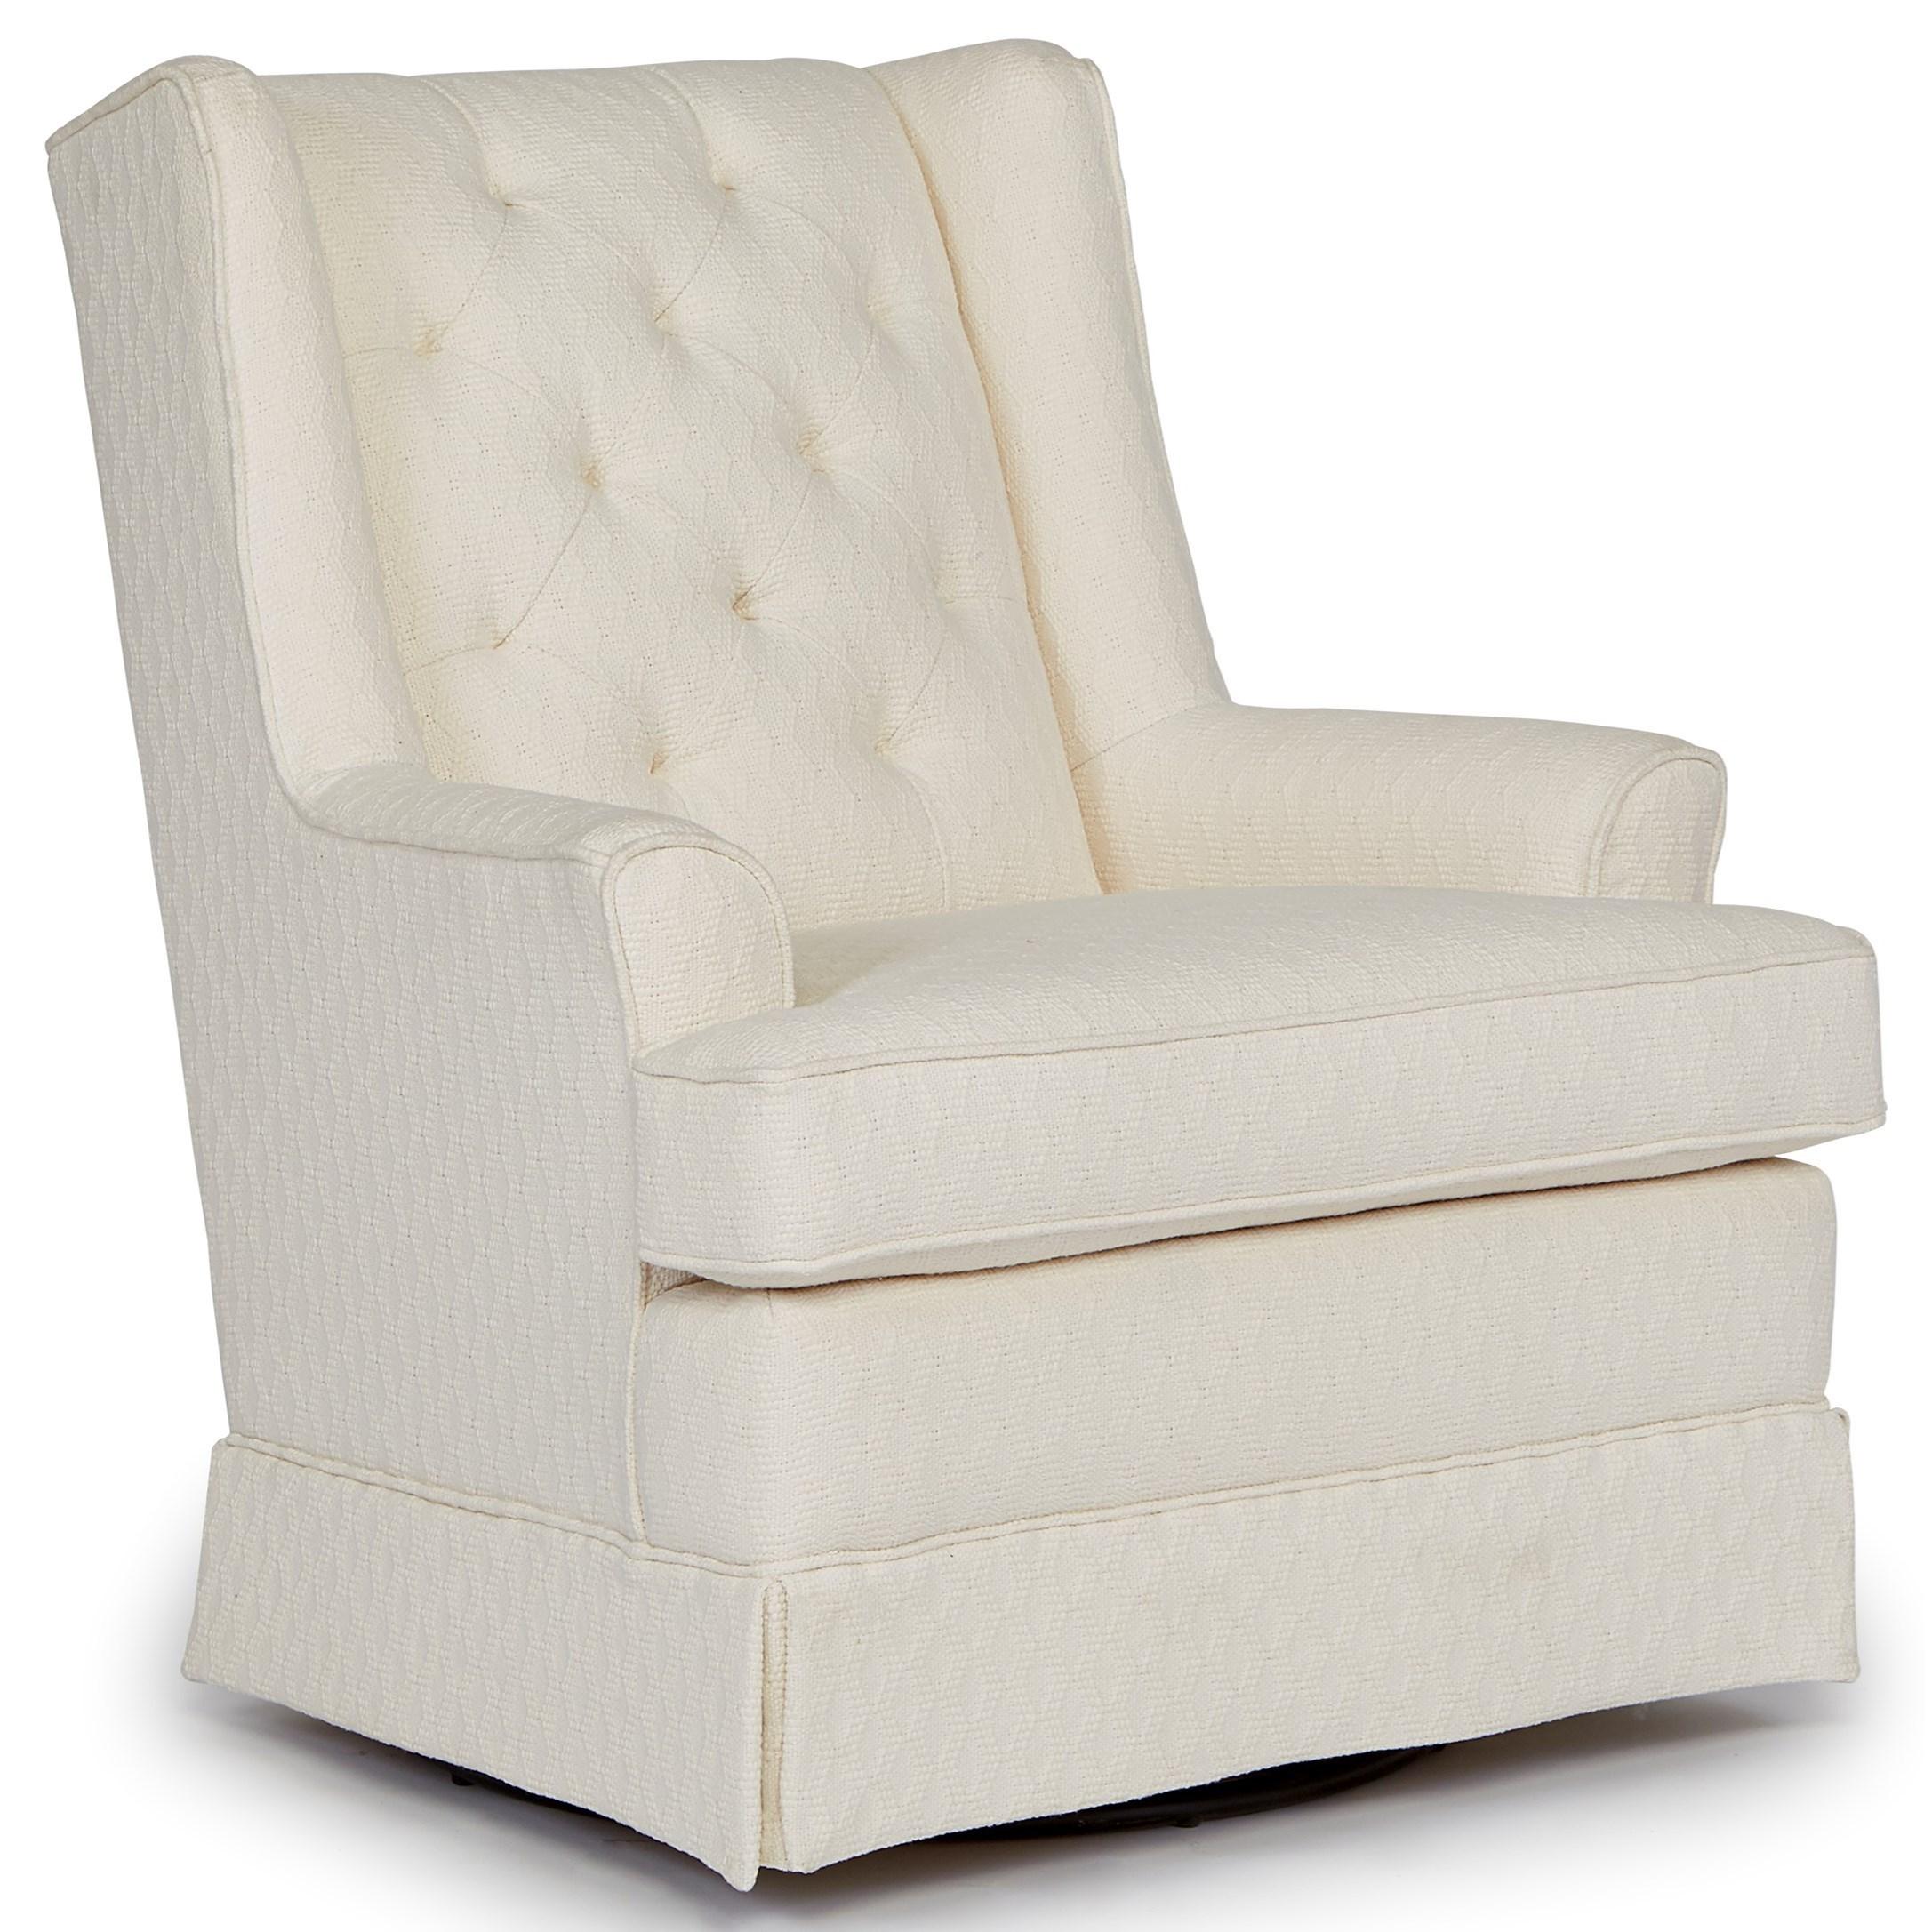 Best Home Furnishings Chairs  Swivel Glide 7167 Nikole